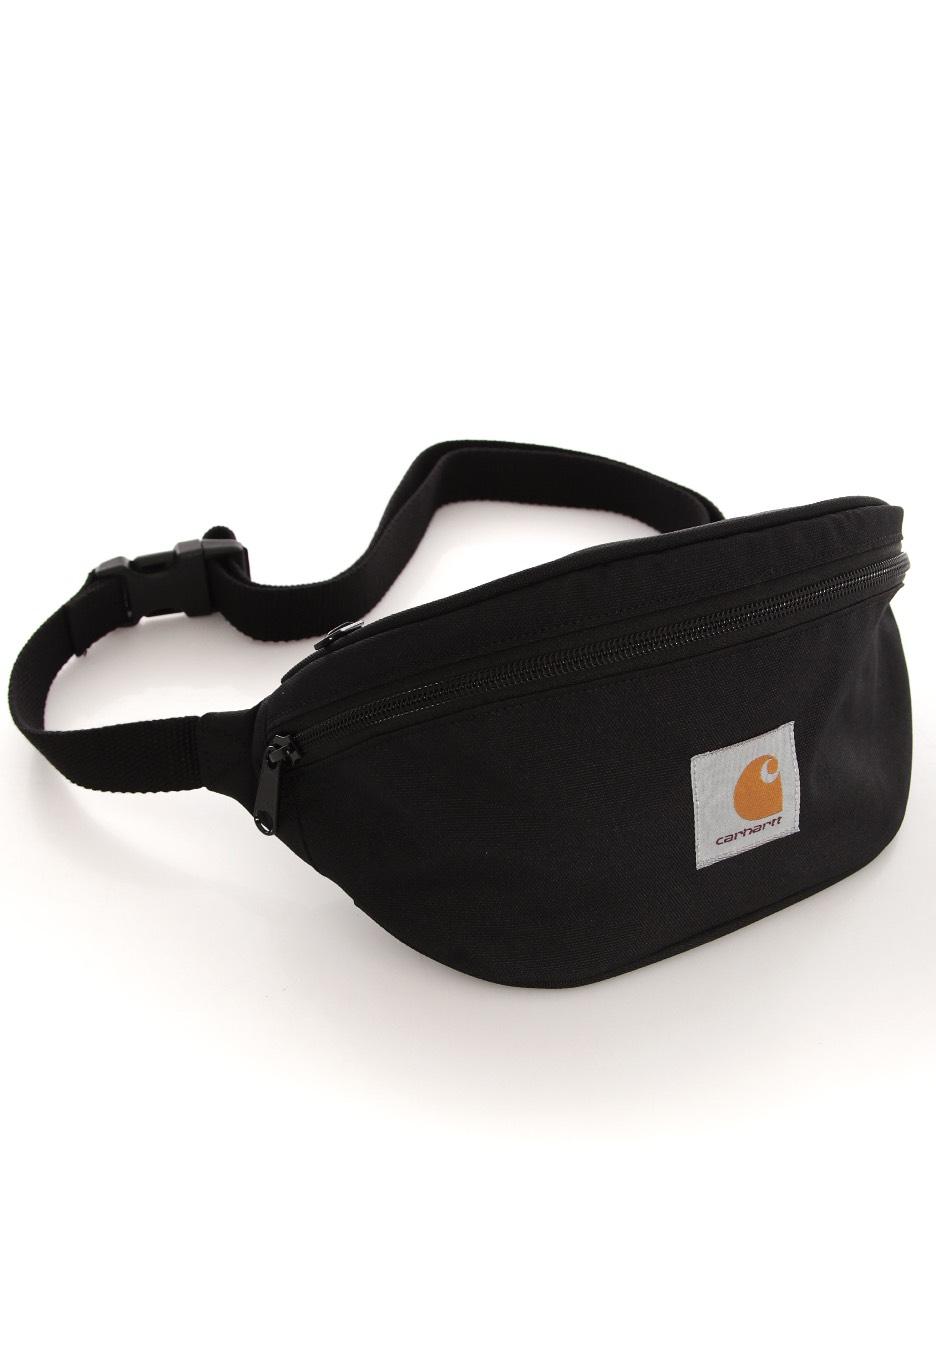 Carhartt Wip Watch Black Hip Bag